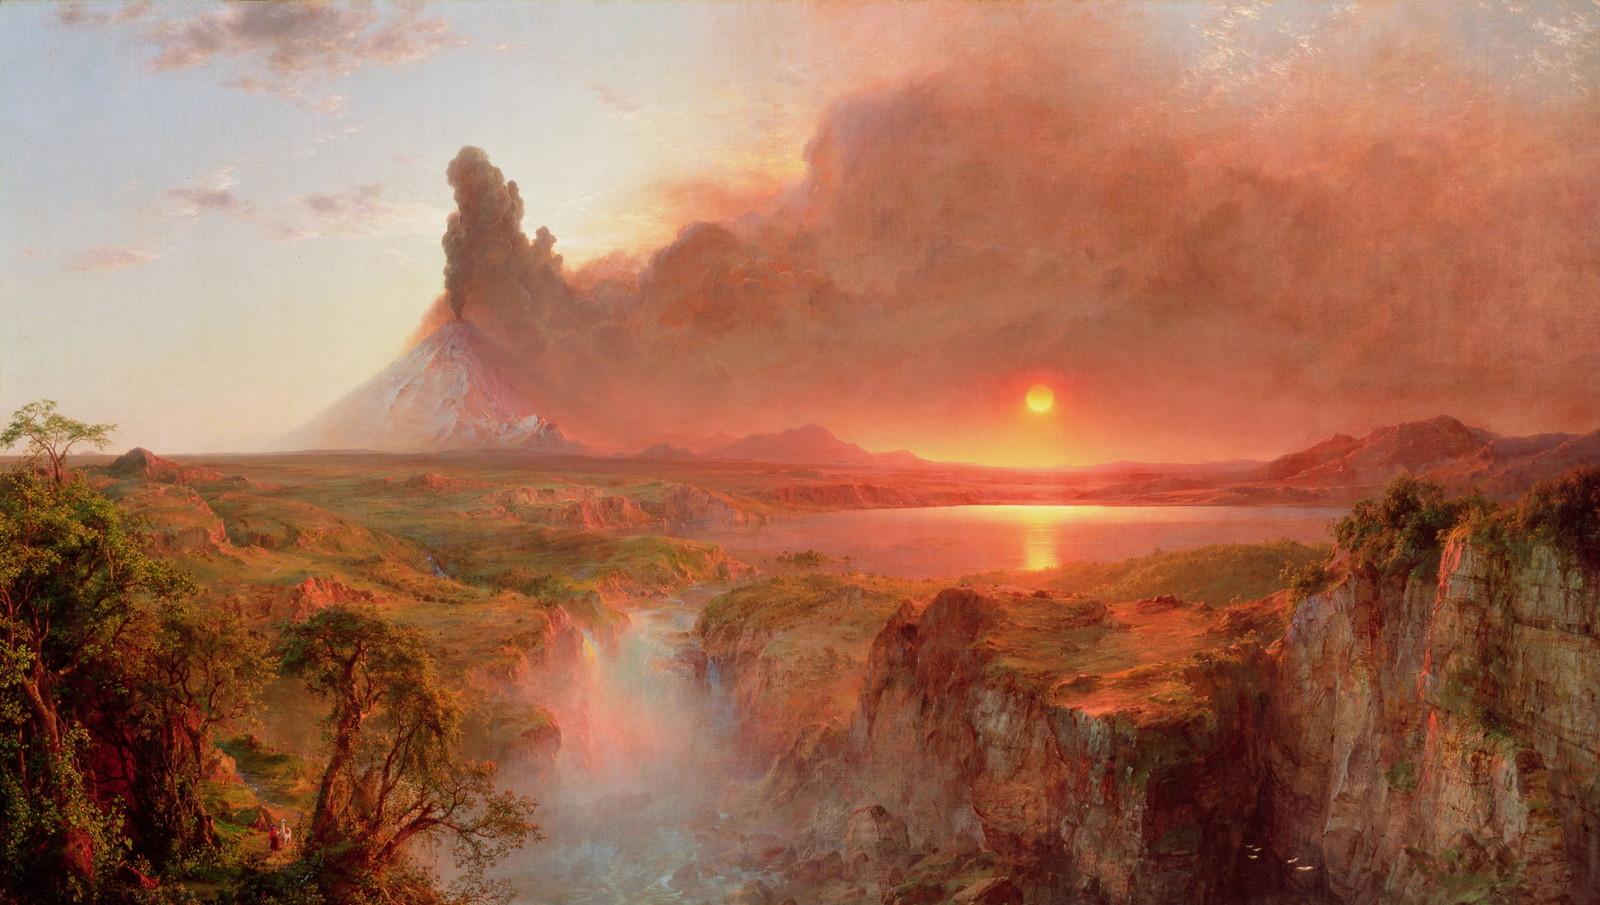 Обои водопад, Пейзаж, картина, Сердце Анд, Фредерик Эдвин Чёрч. Разное foto 8